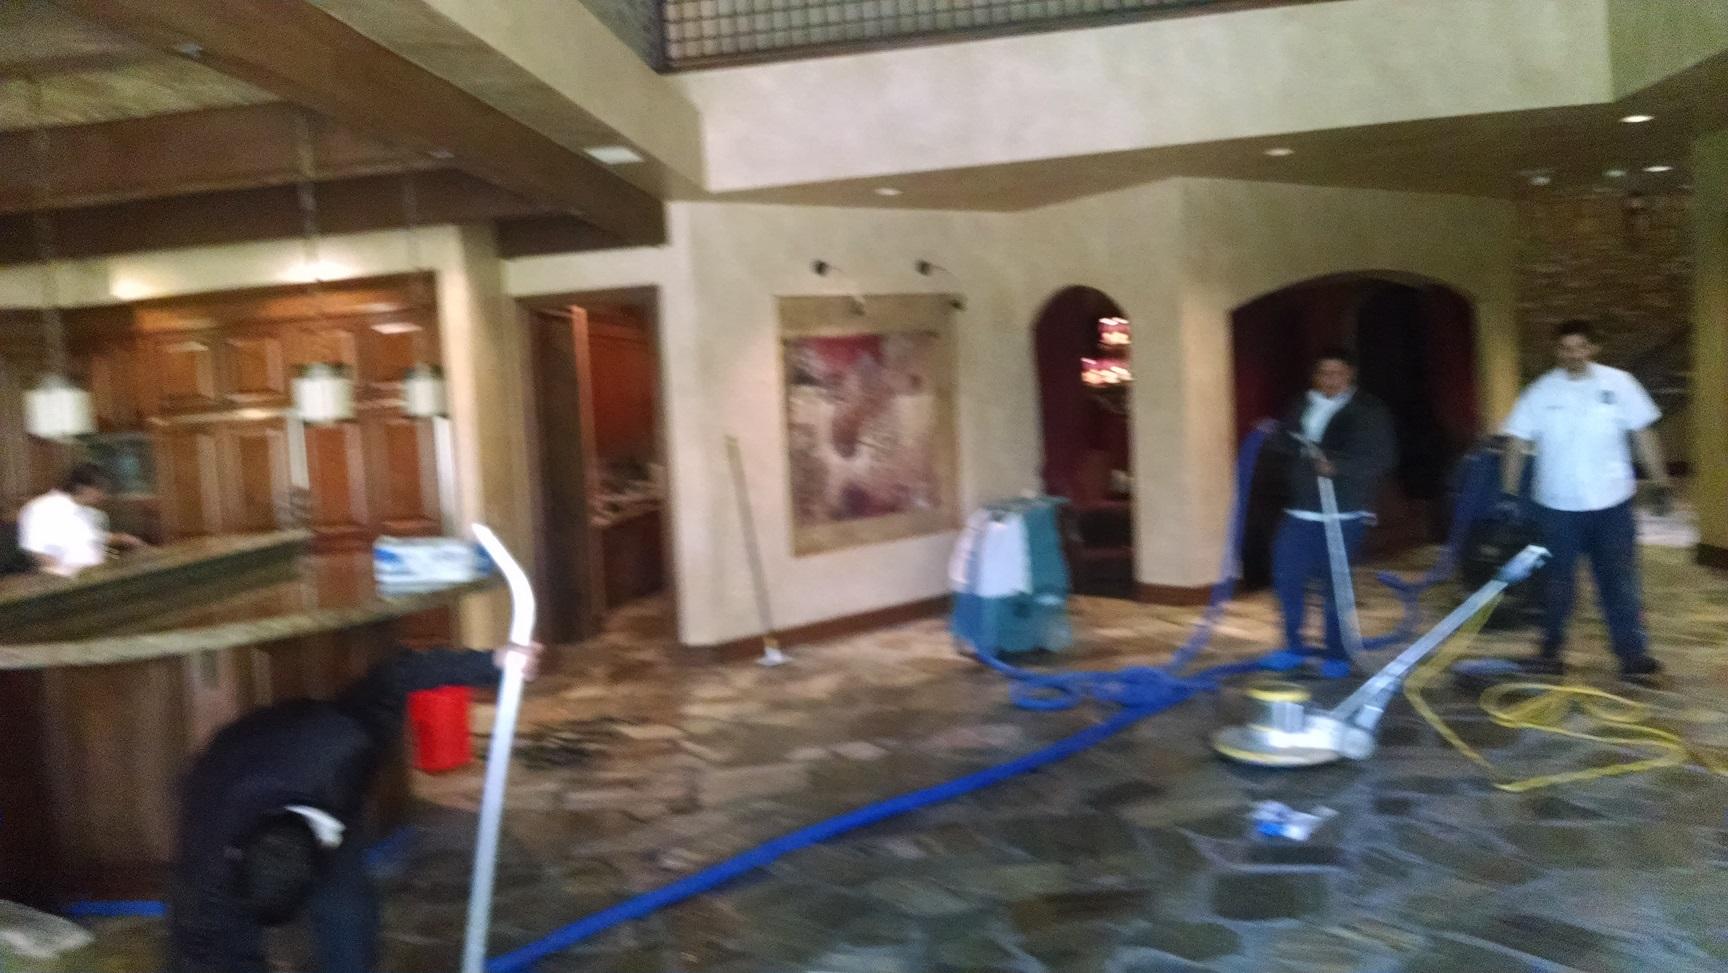 ss-floor-restoration-natural-stone-polishing-small